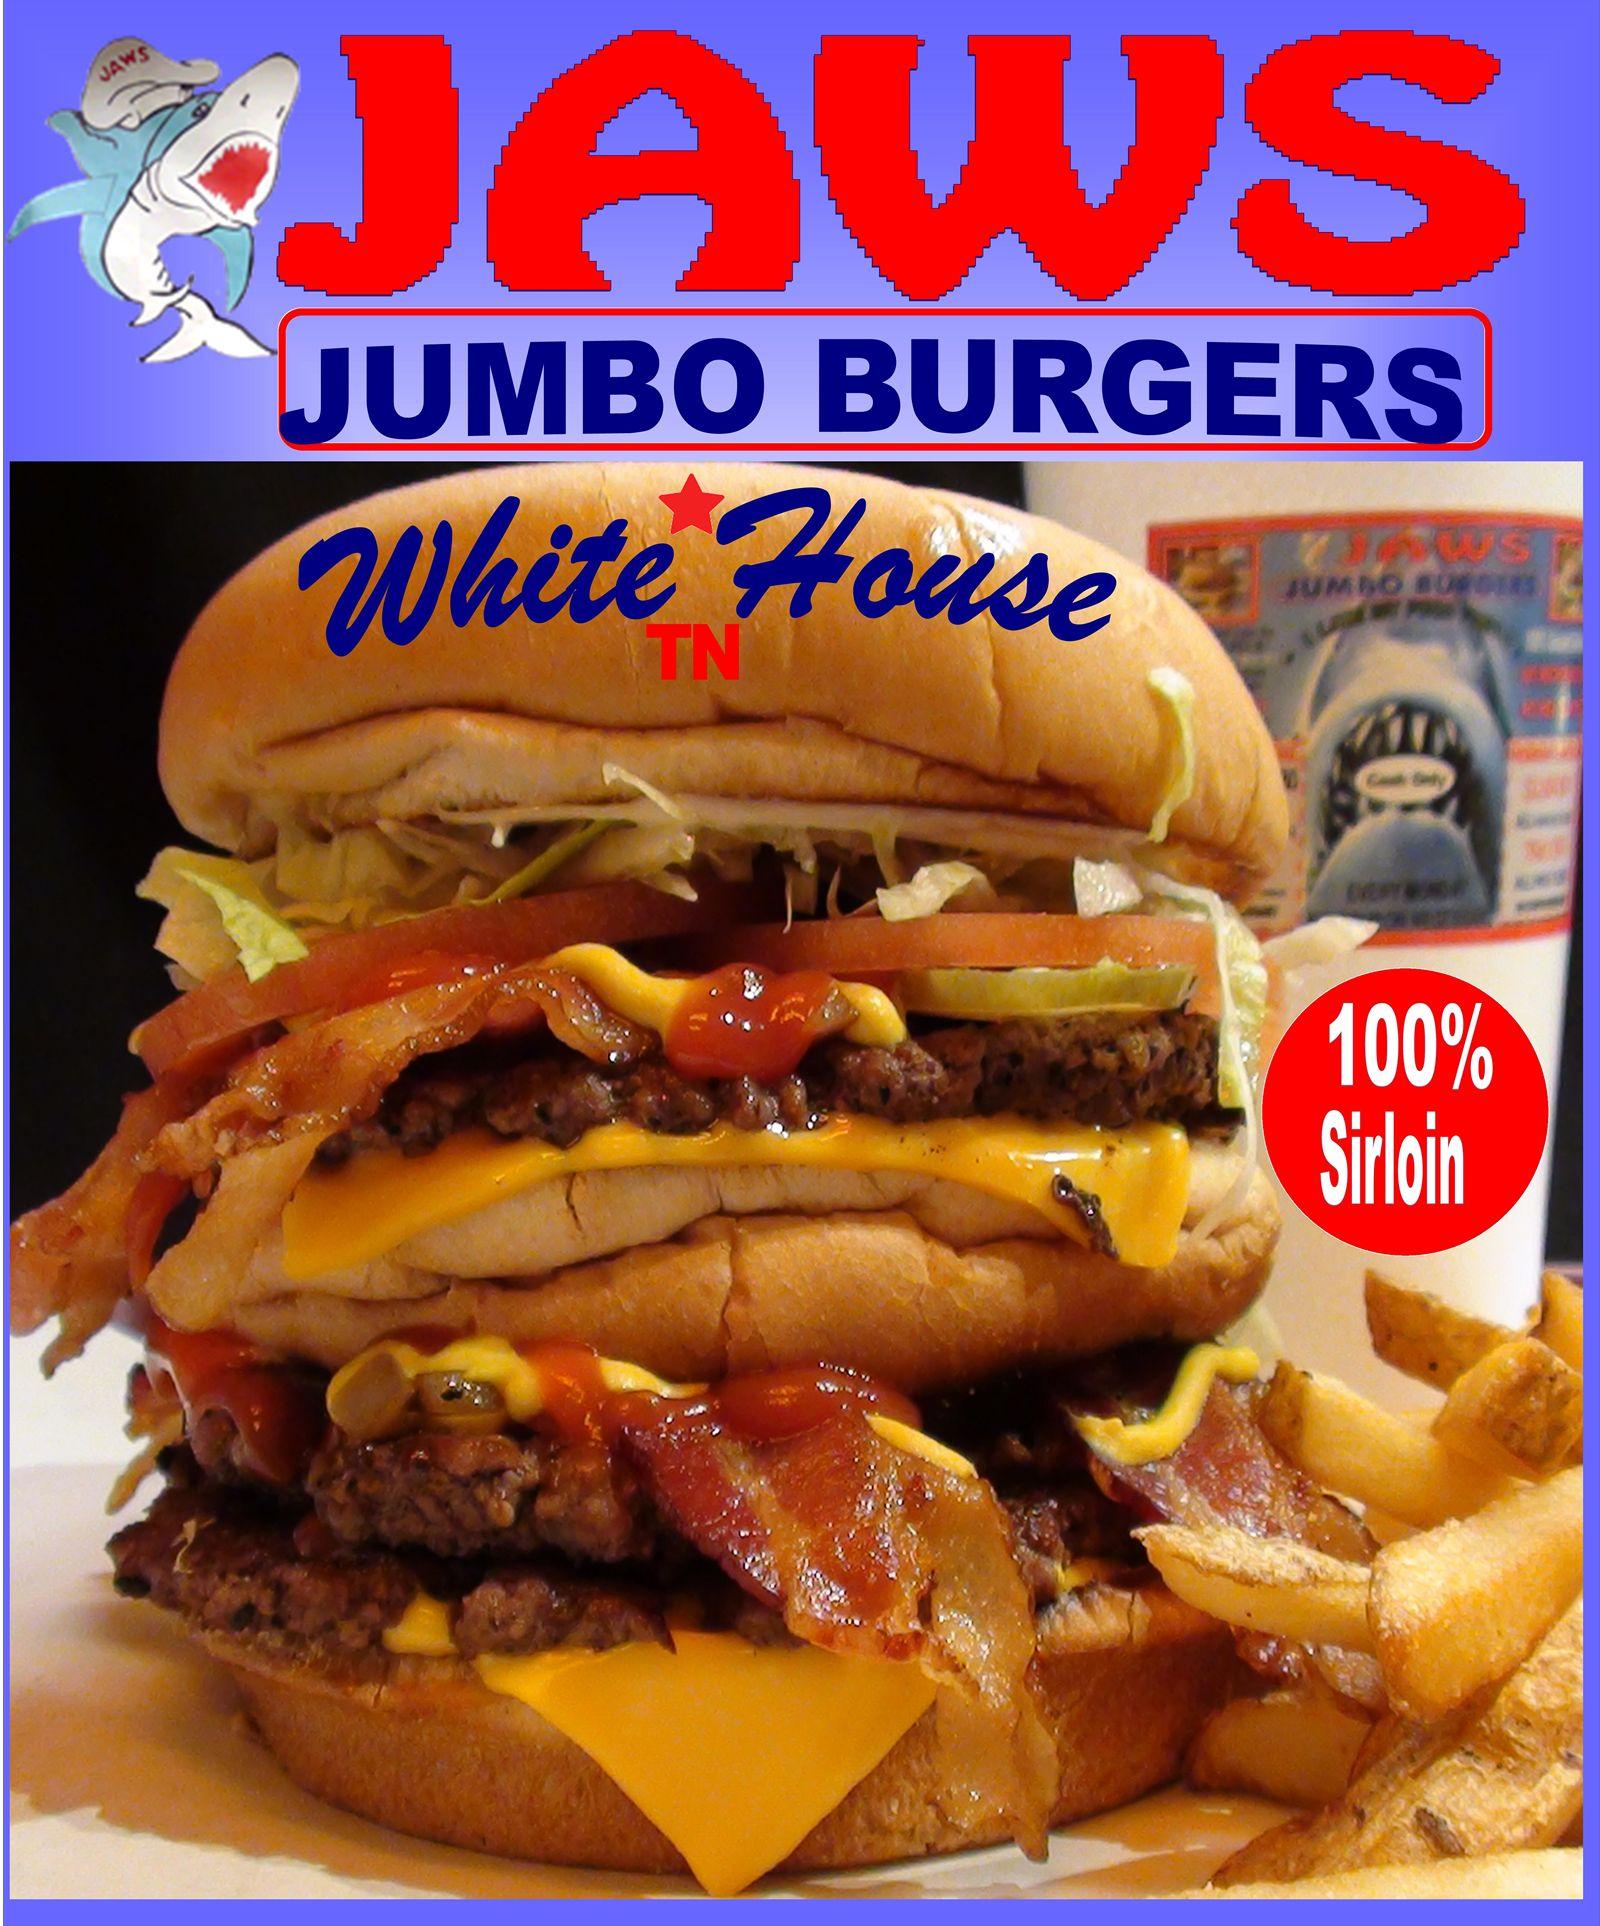 Jaws Jumbo Burgers Utilizing Revolutionary Limited Partnership Agreement for Expansion